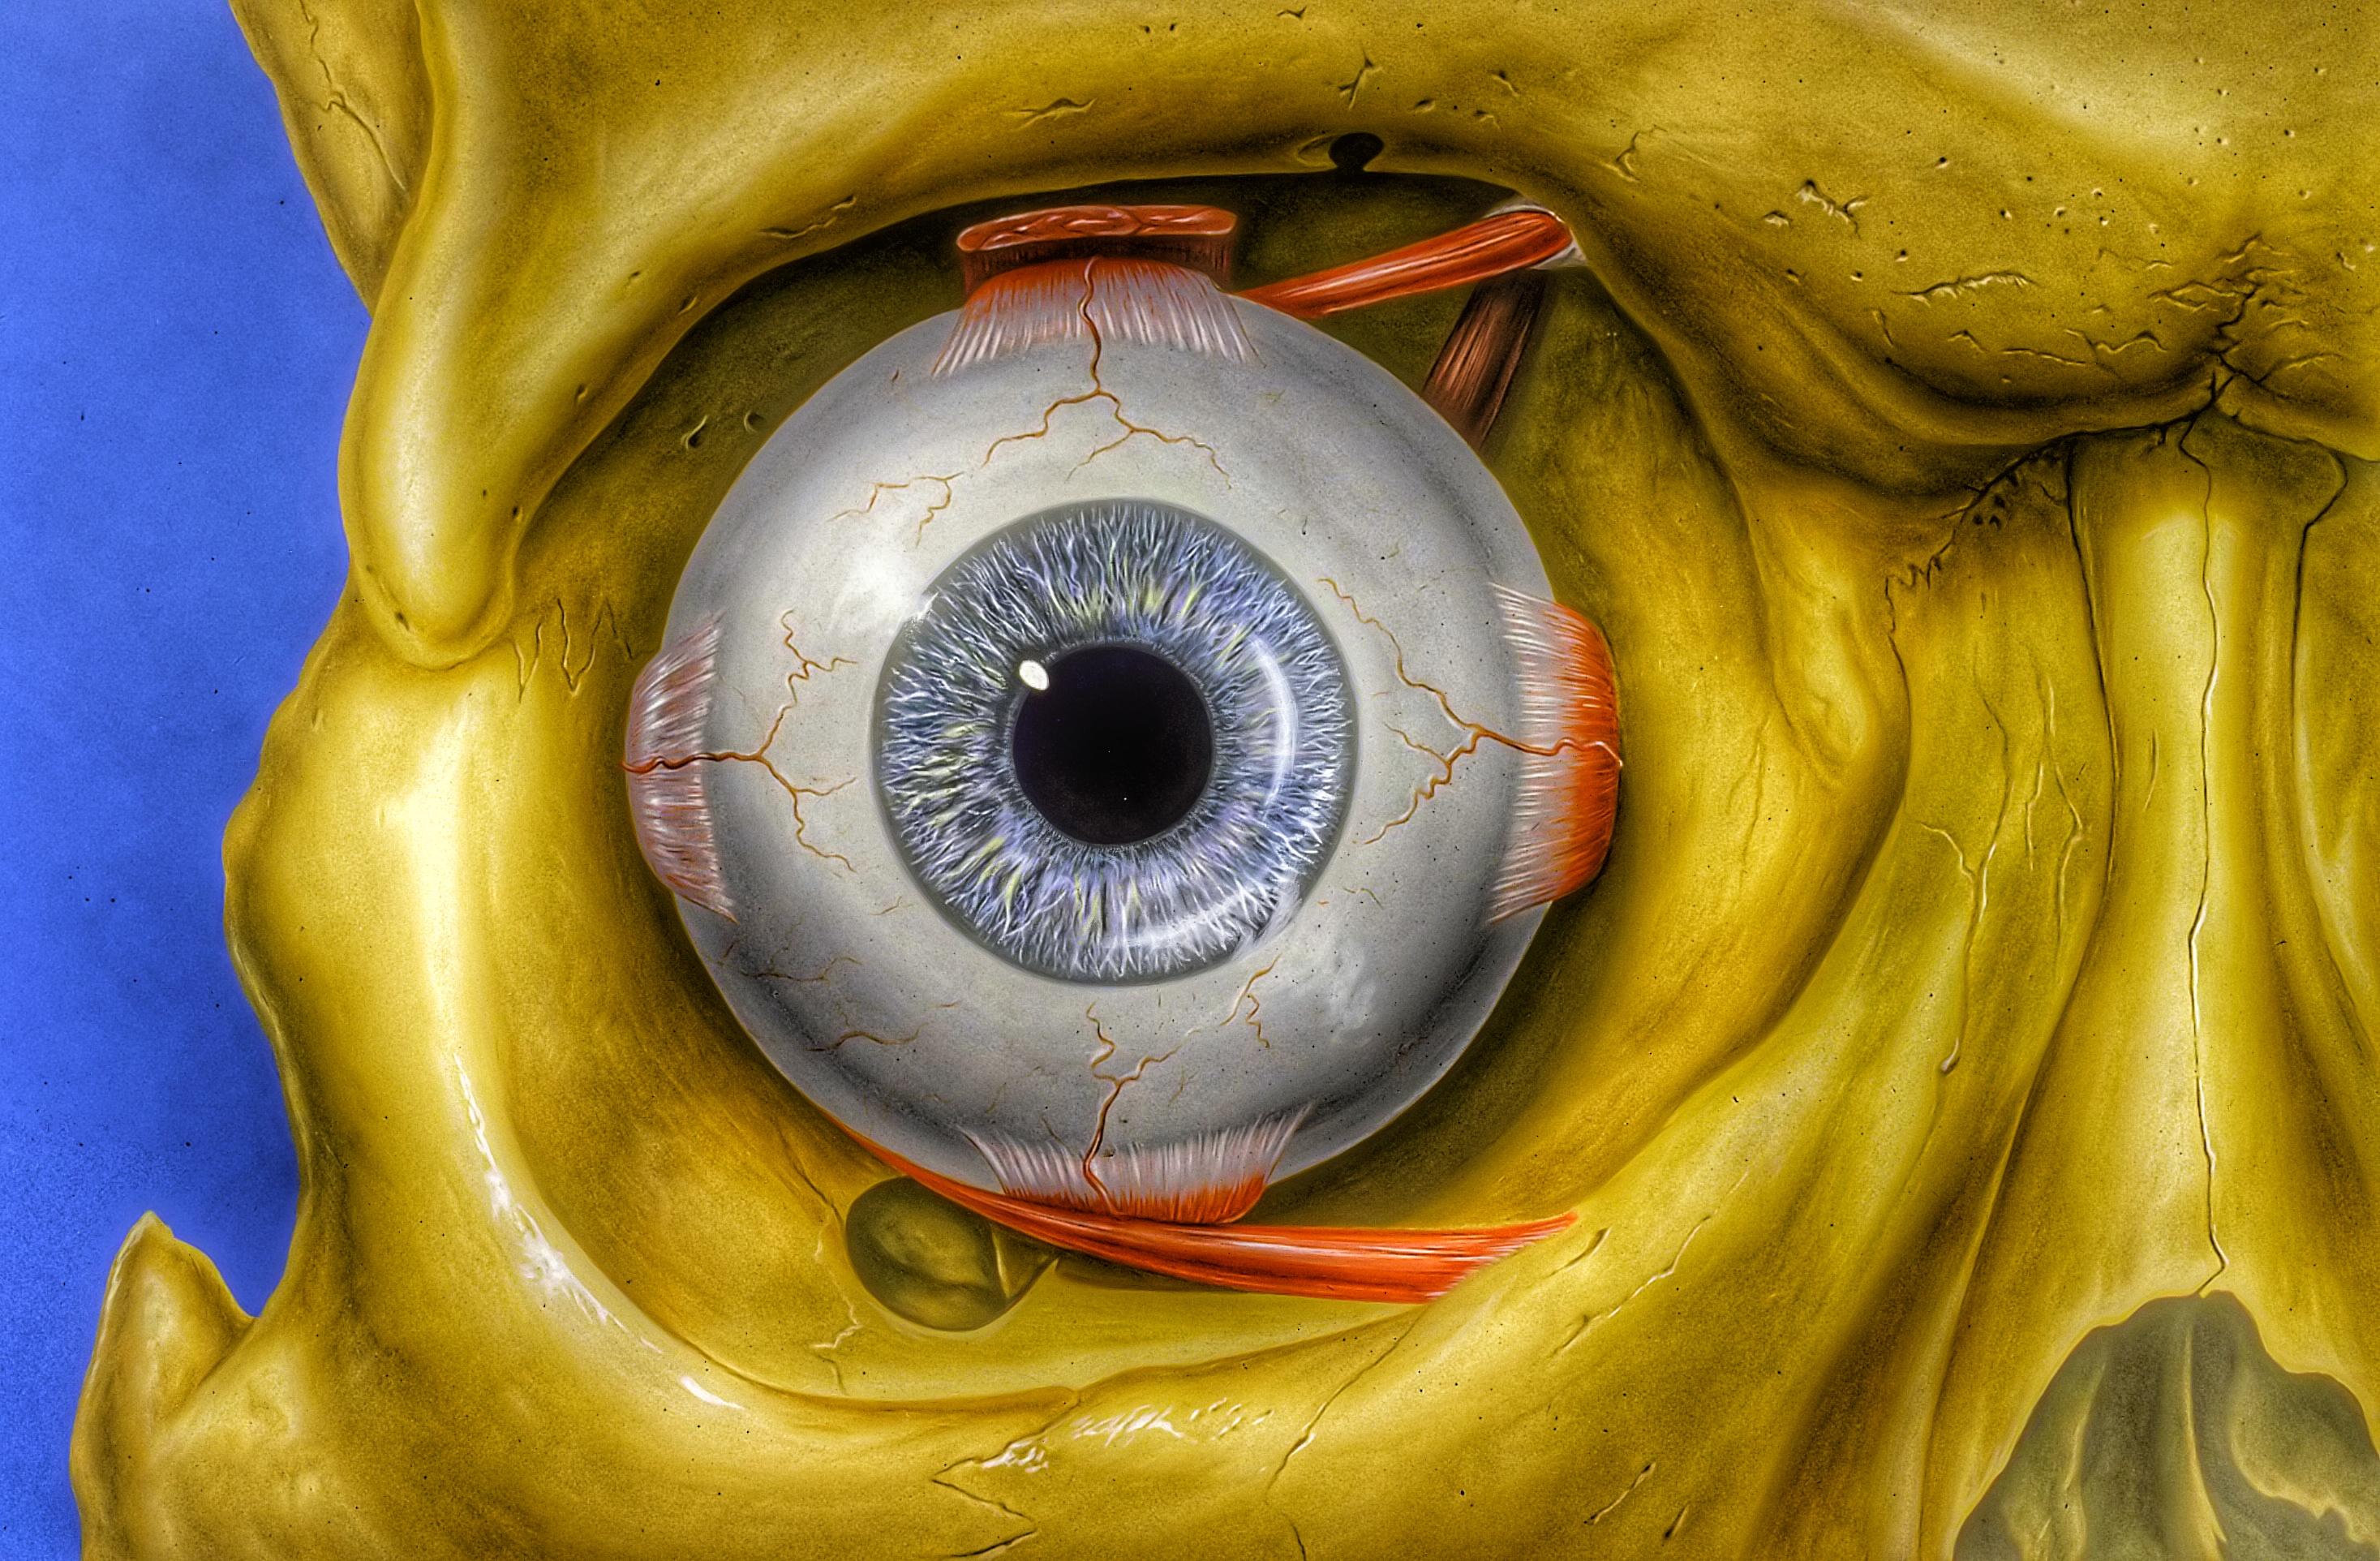 Wallpaper : 2934x1924 px, Eye Orbit Anatomy 2934x1924 ...